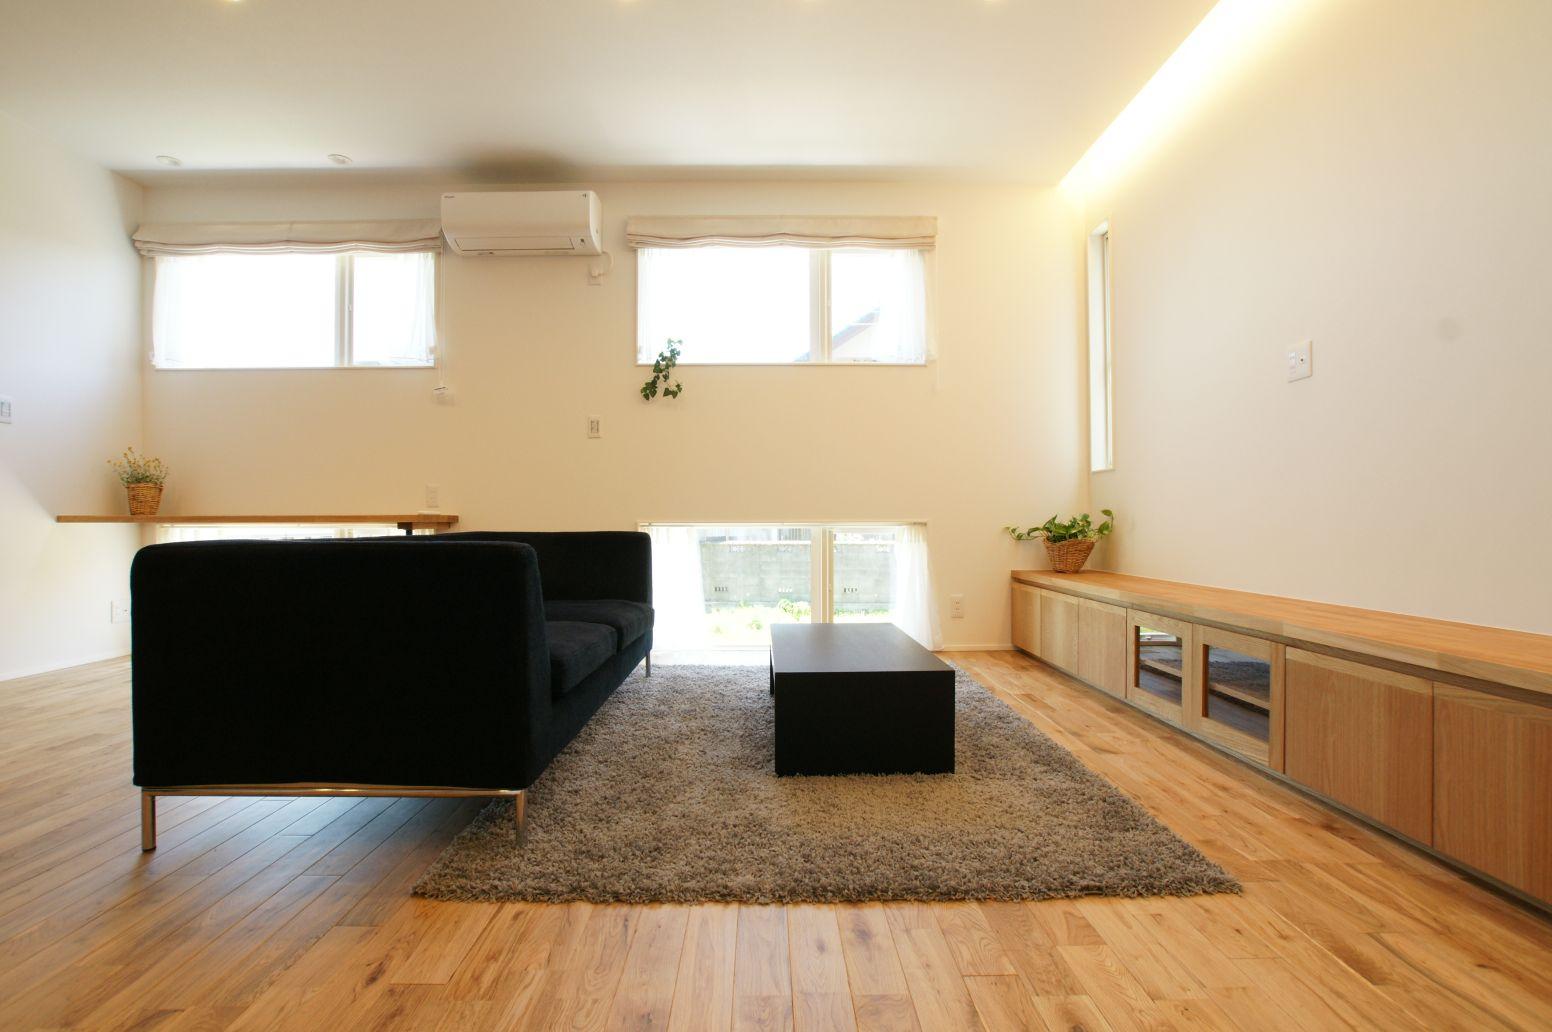 RIKYU (リキュー)【デザイン住宅、間取り、インテリア】外のひかりをふんだんに取り入れ開放的な印象に